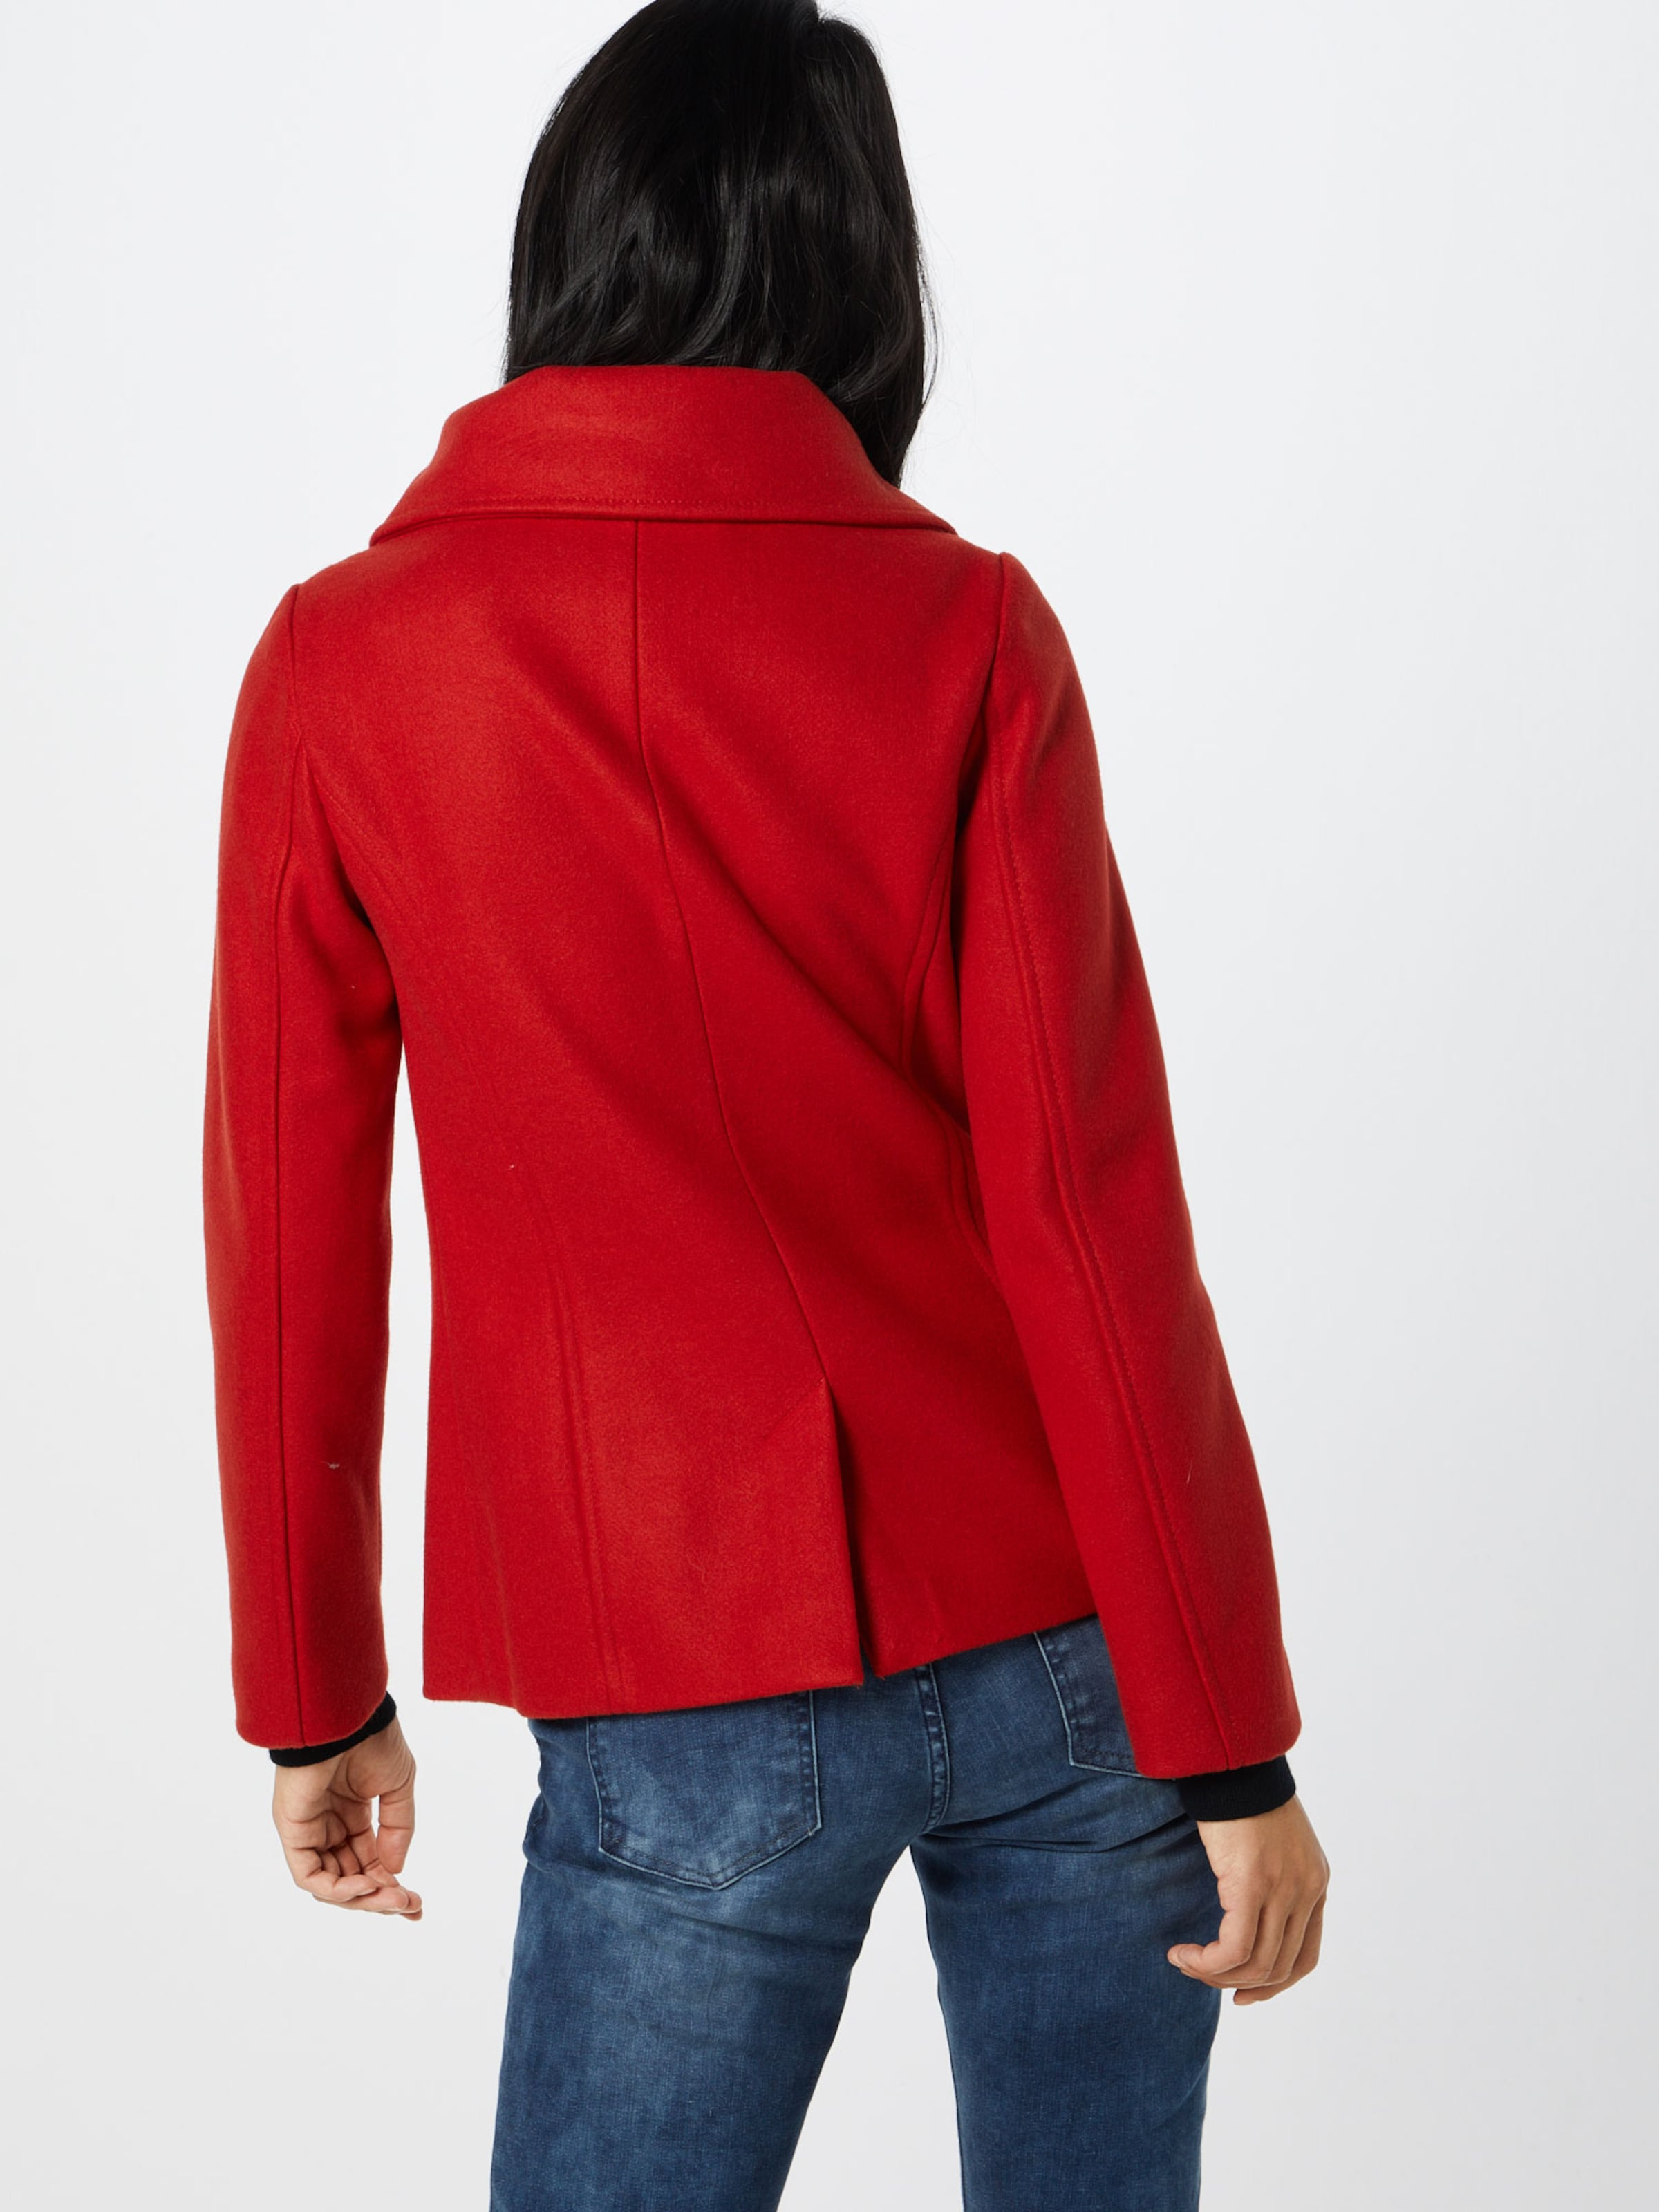 Label Hellrot Red Jacke In S oliver JTFKl1c